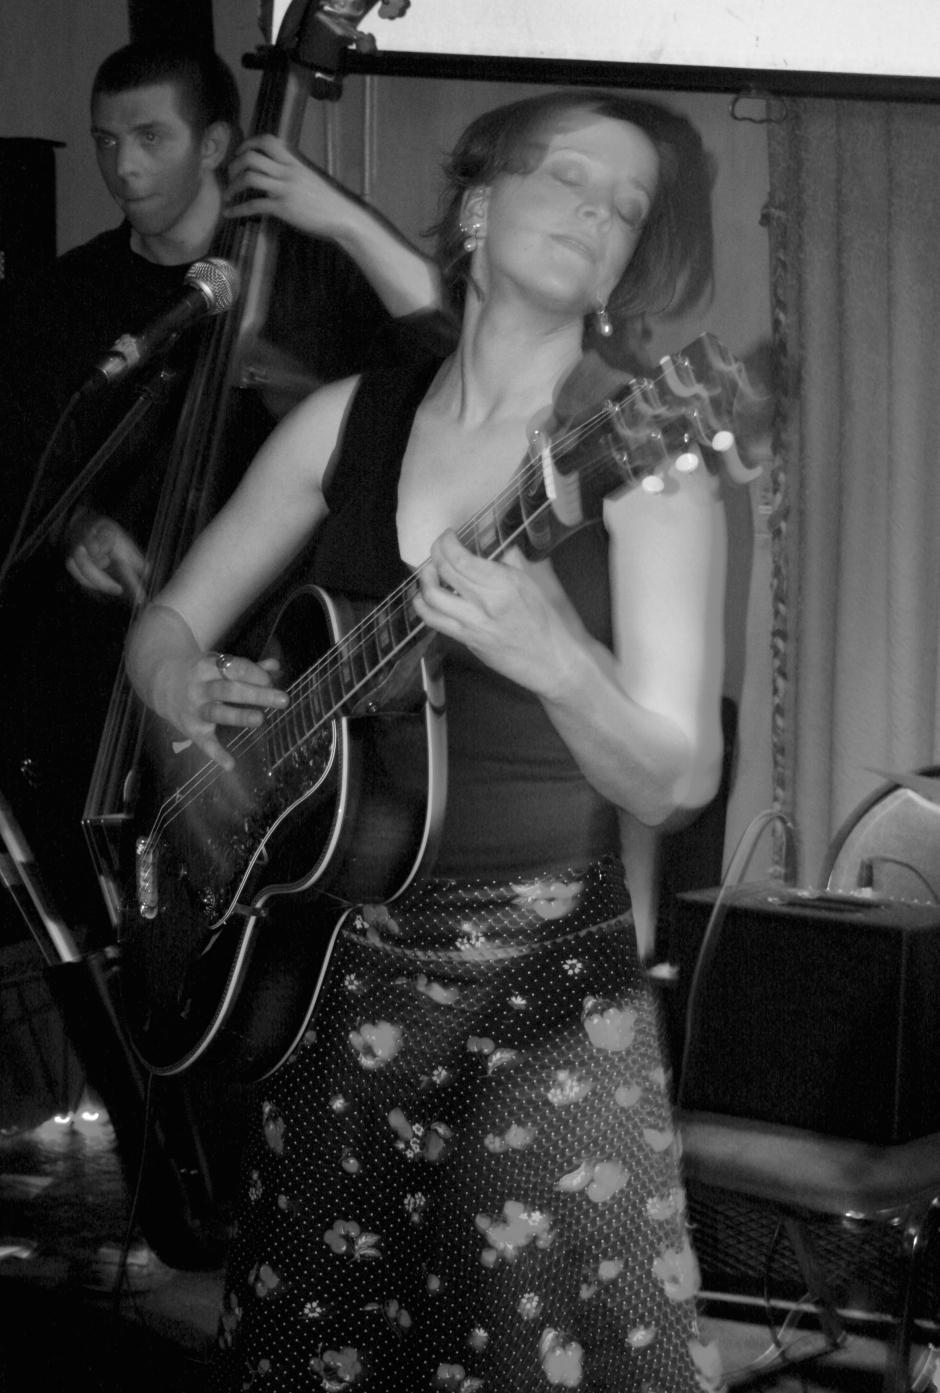 Miss Tess & The Bon Ton Parade January 2008 at The Juggling Gypsy - photo Brian Tucker